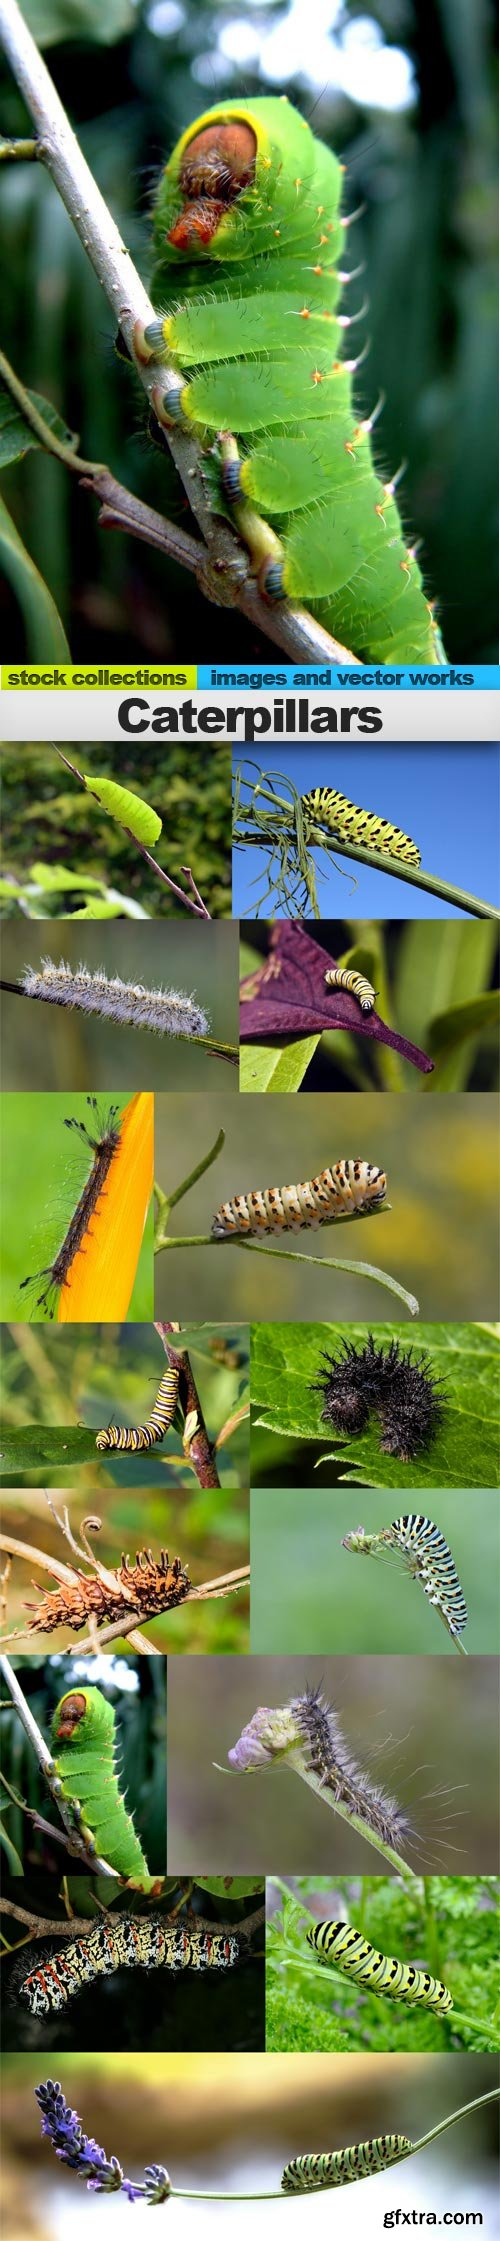 Caterpillars, 15 x UHQ JPEG